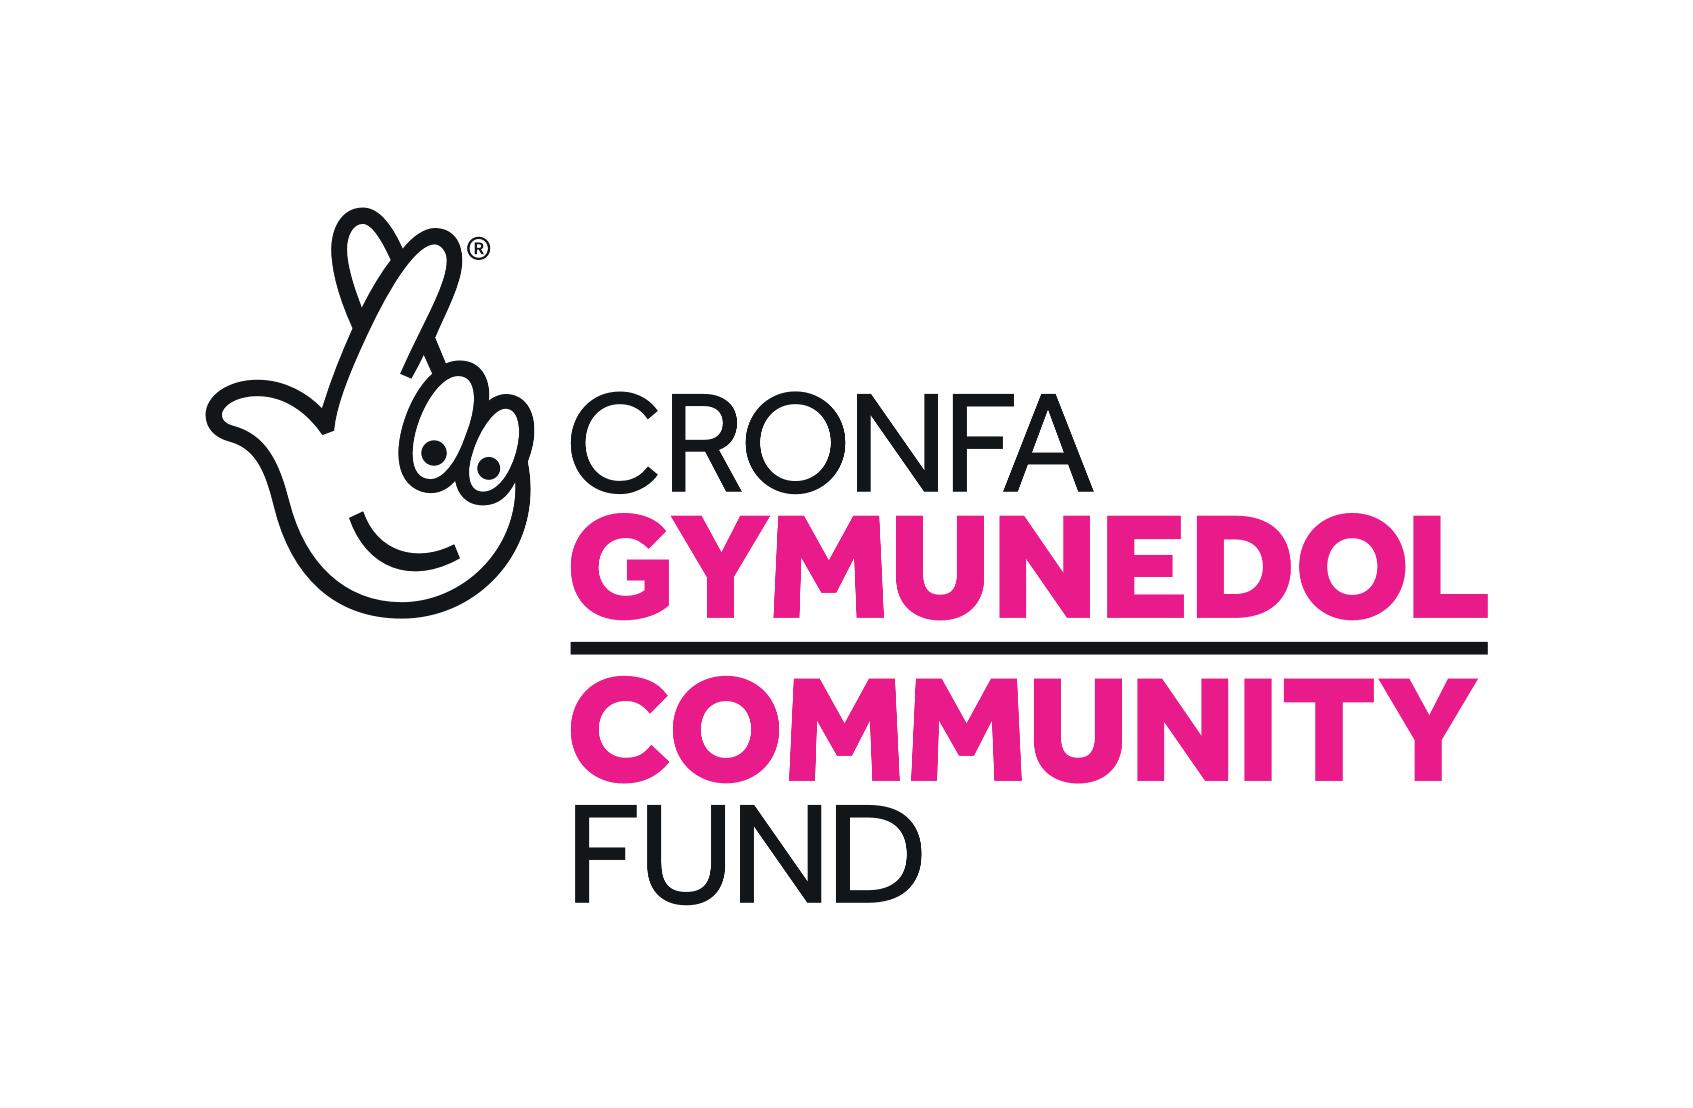 National Lottery Community Fund Logo - Cronfa Cymunedol Loteri Genedlaethol